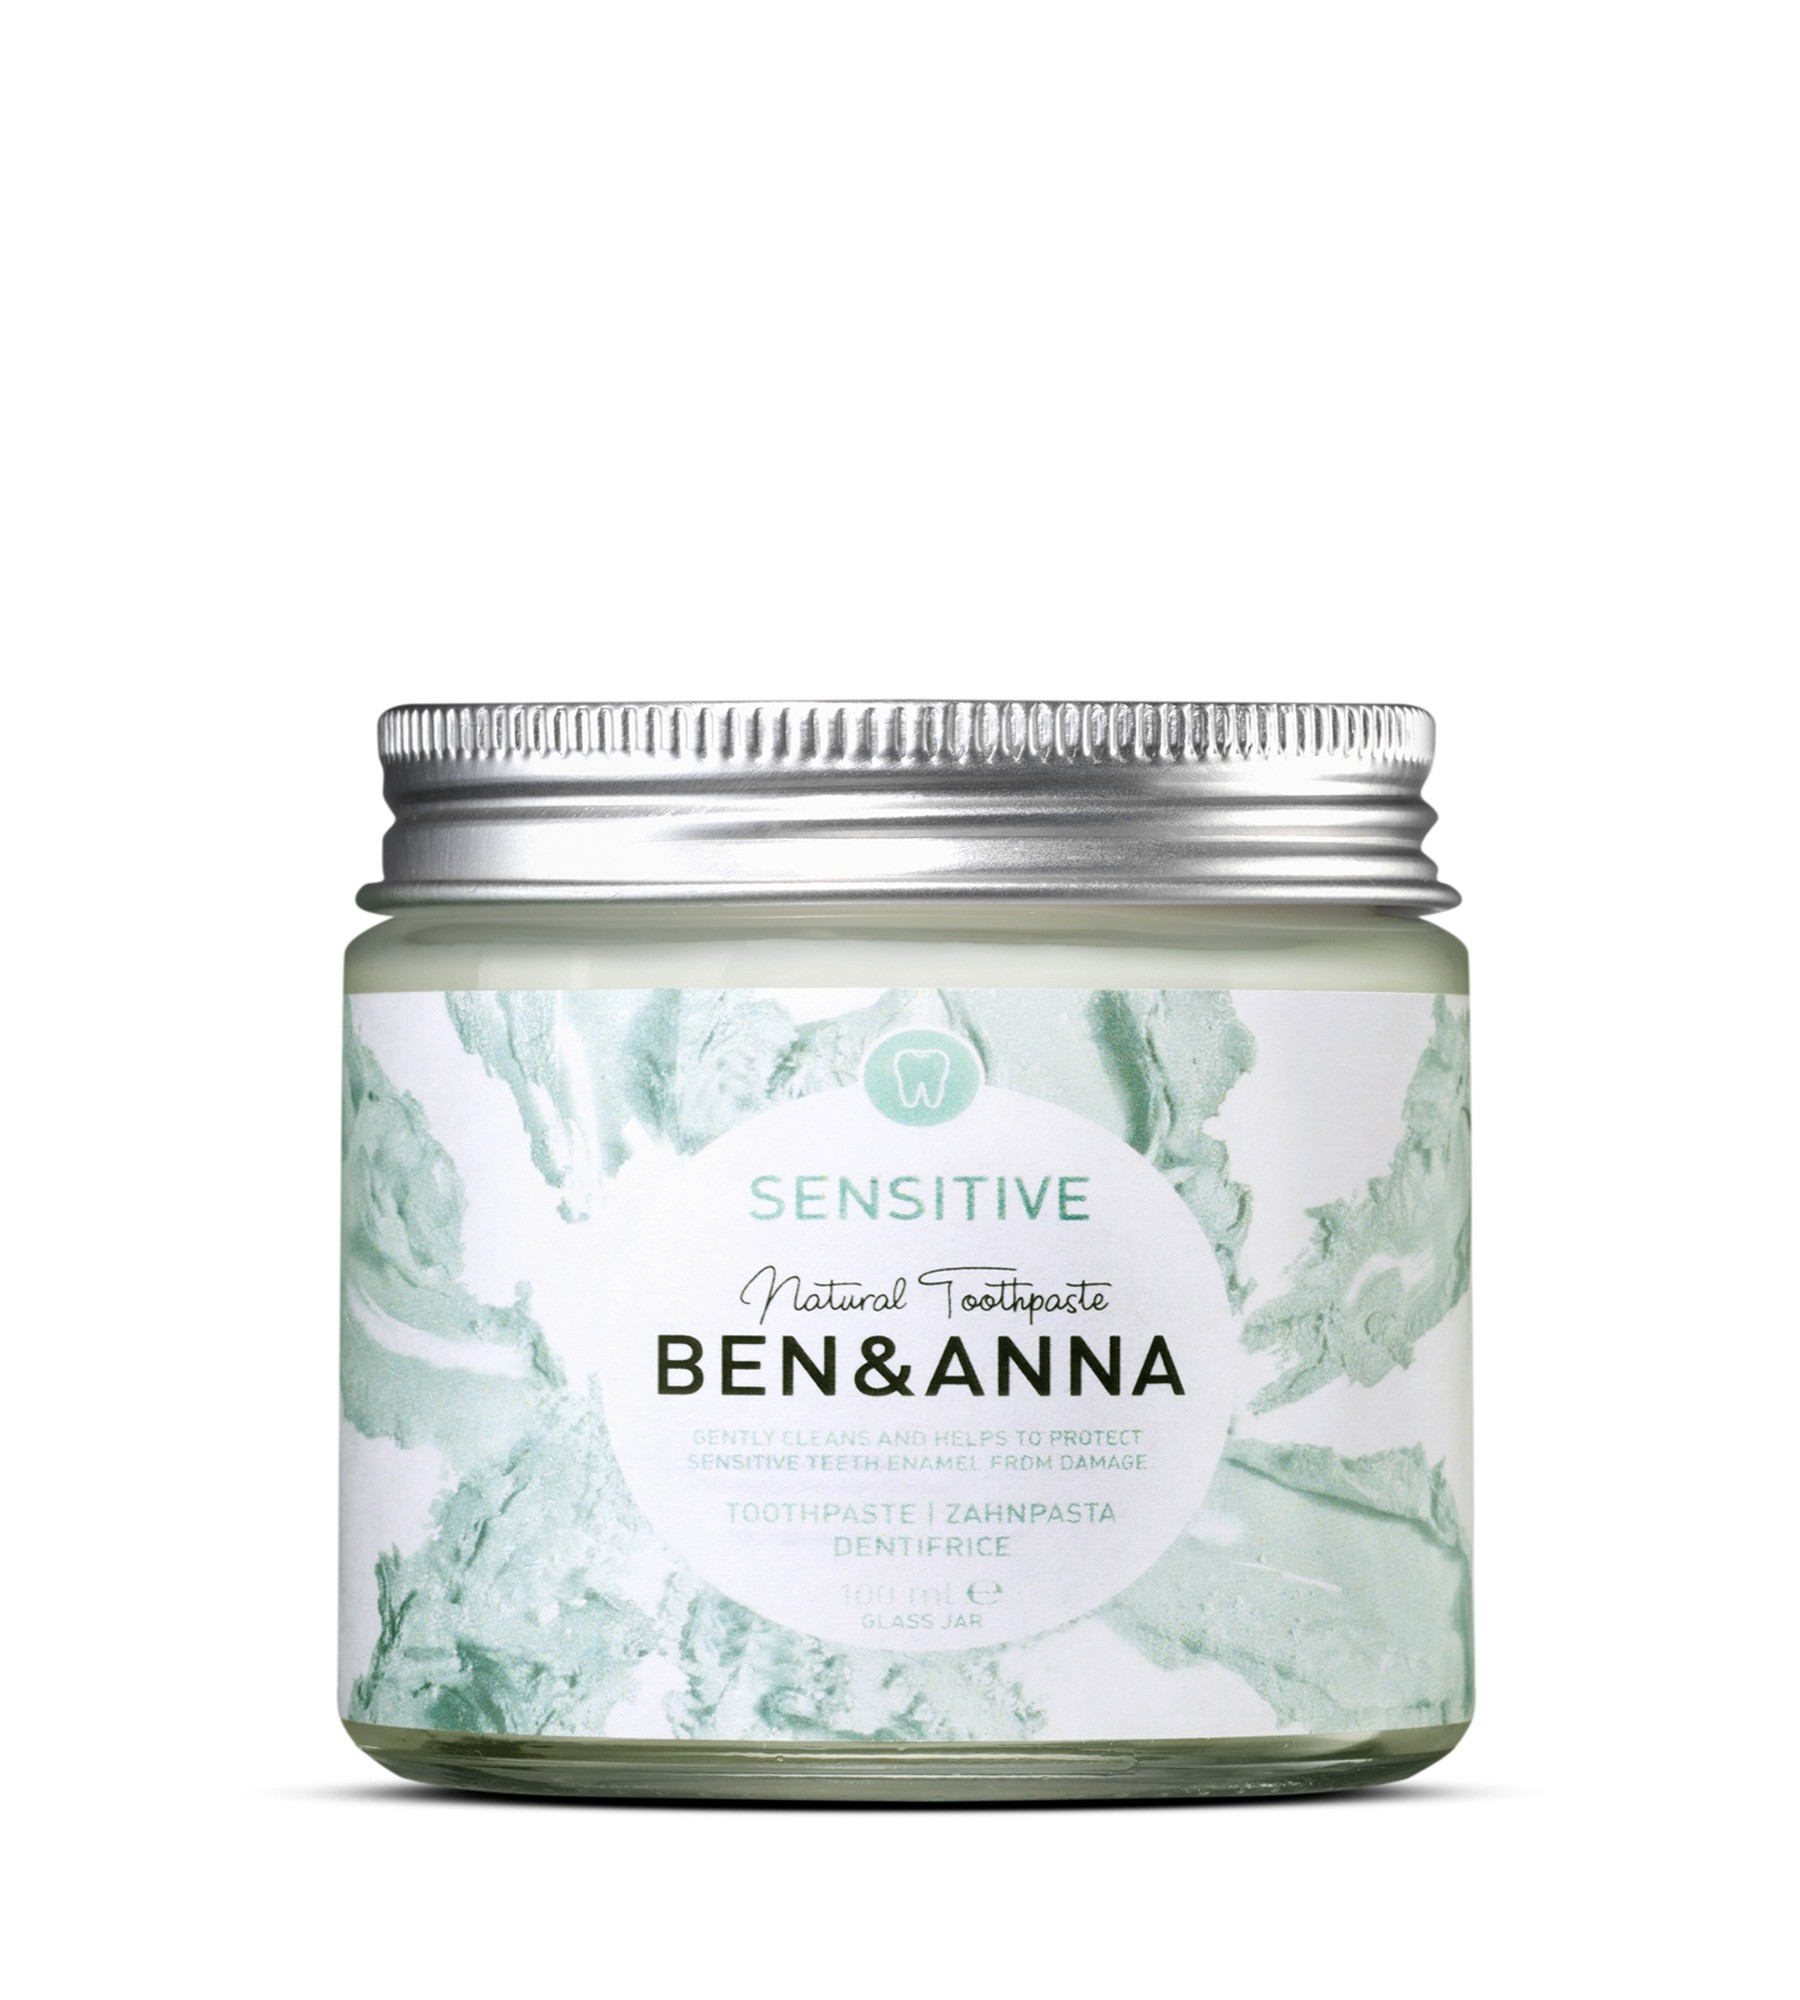 Ben & Anna Toothpaste Sensitive